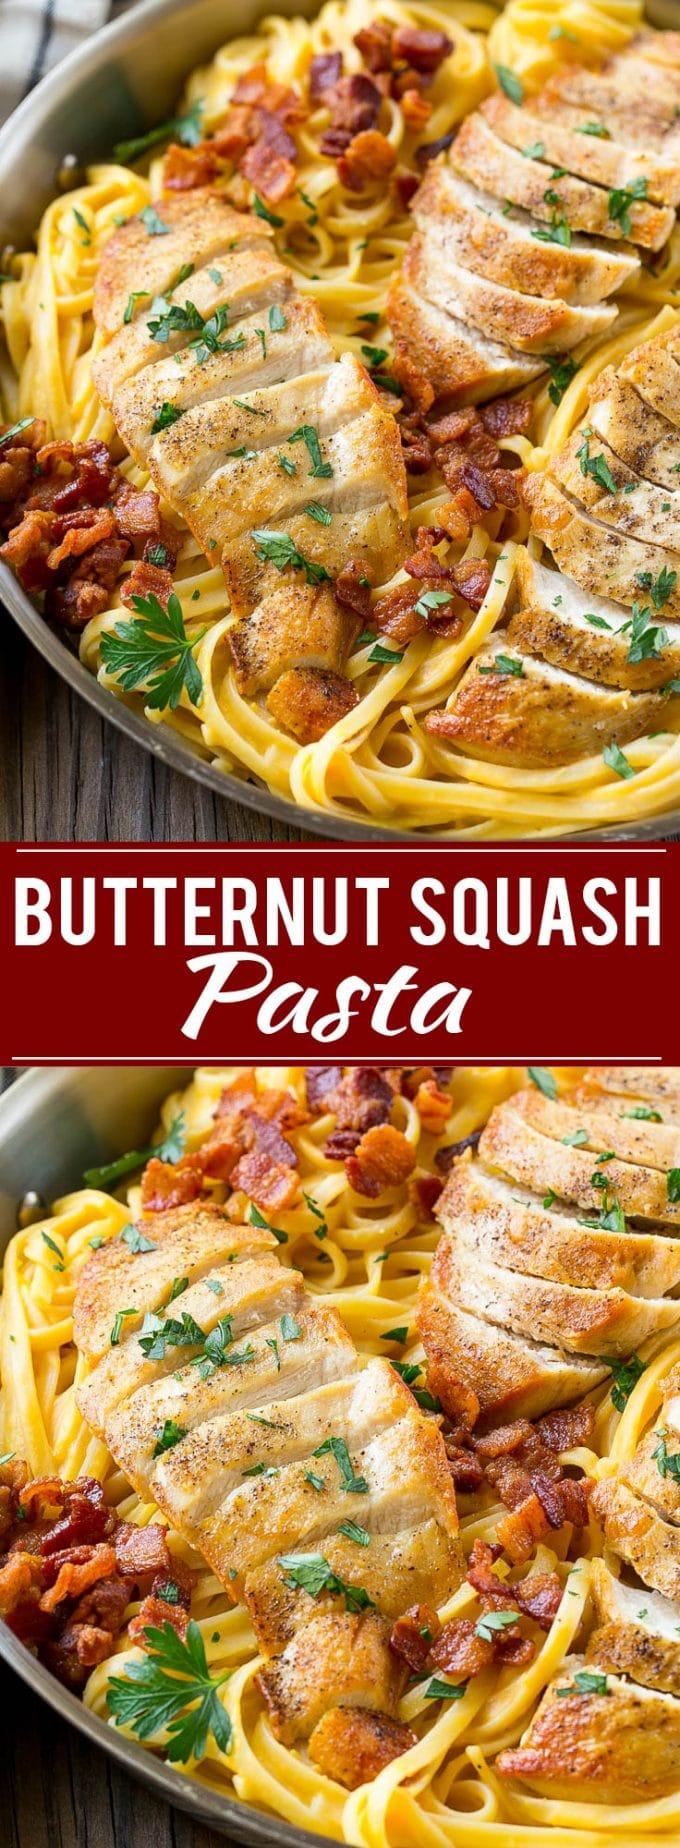 Butternut Squash Pasta with Chicken Recipe | Chicken Pasta Recipe | Butternut Squash Recipe | Easy Dinner Recipe | Pasta Recipe #butternutsquash #pasta #chicken #bacon #dinner #dinneratthezoo